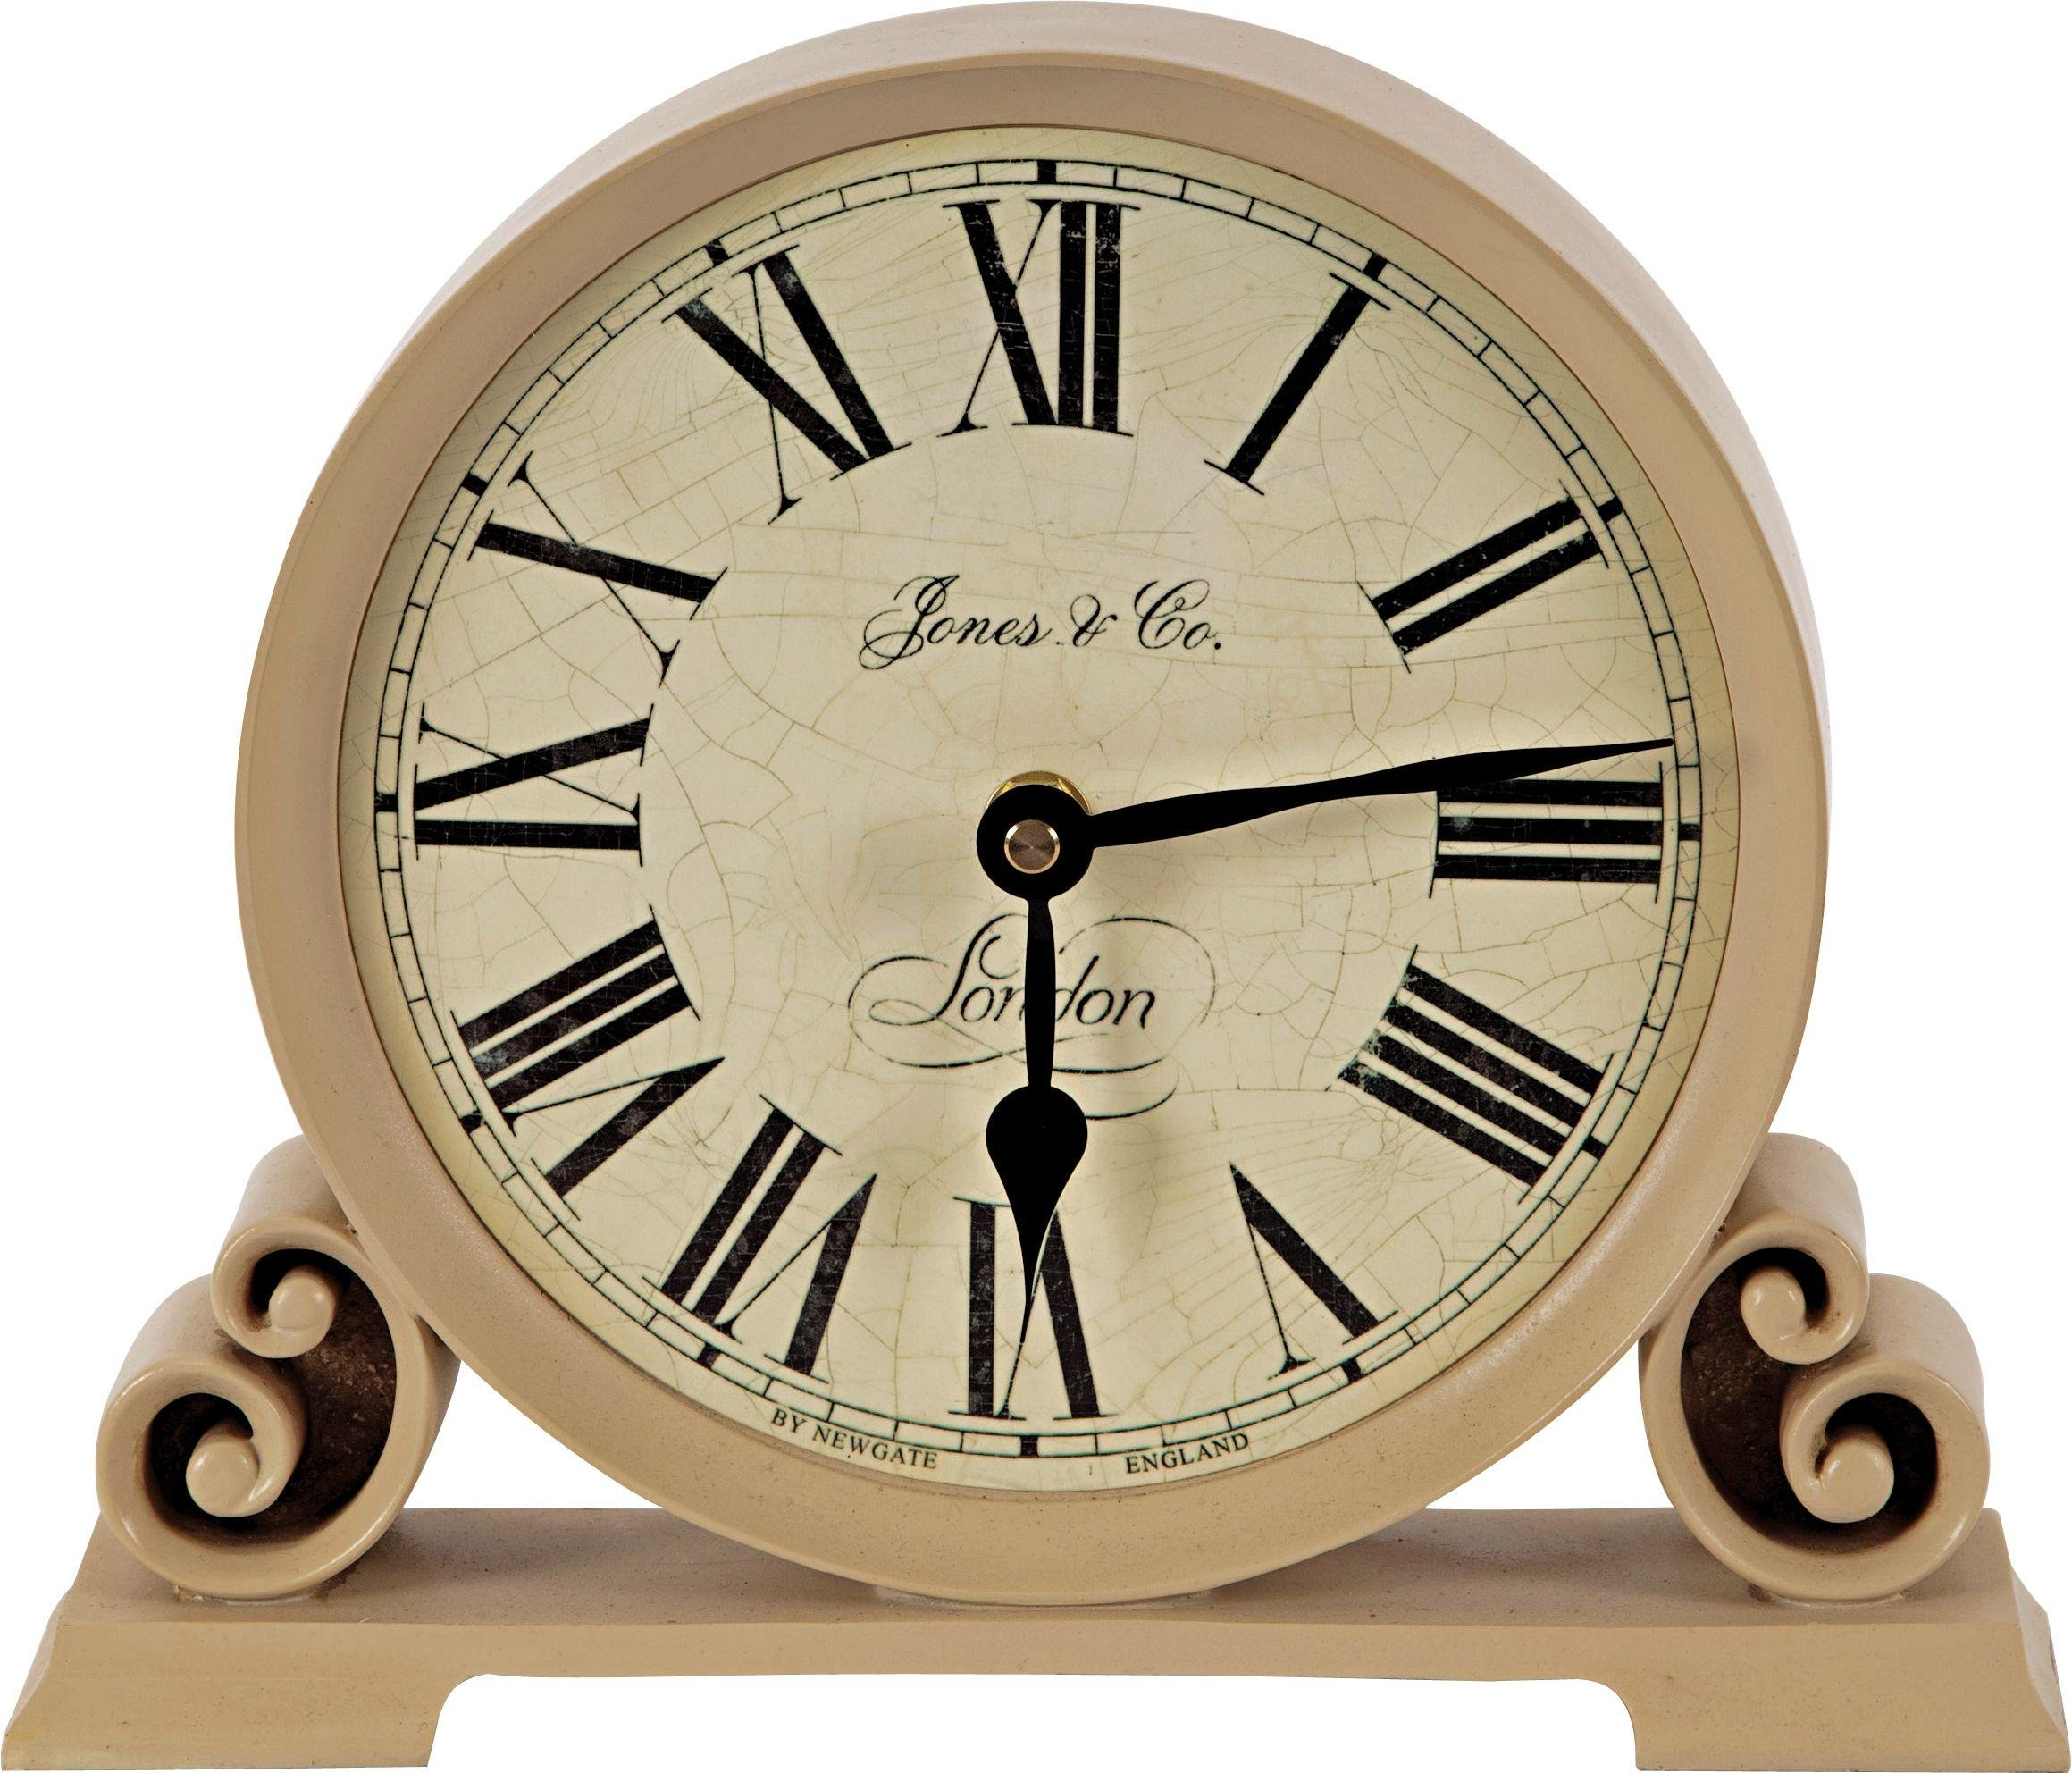 jones cream decorative mantel clock - Mantel Clock